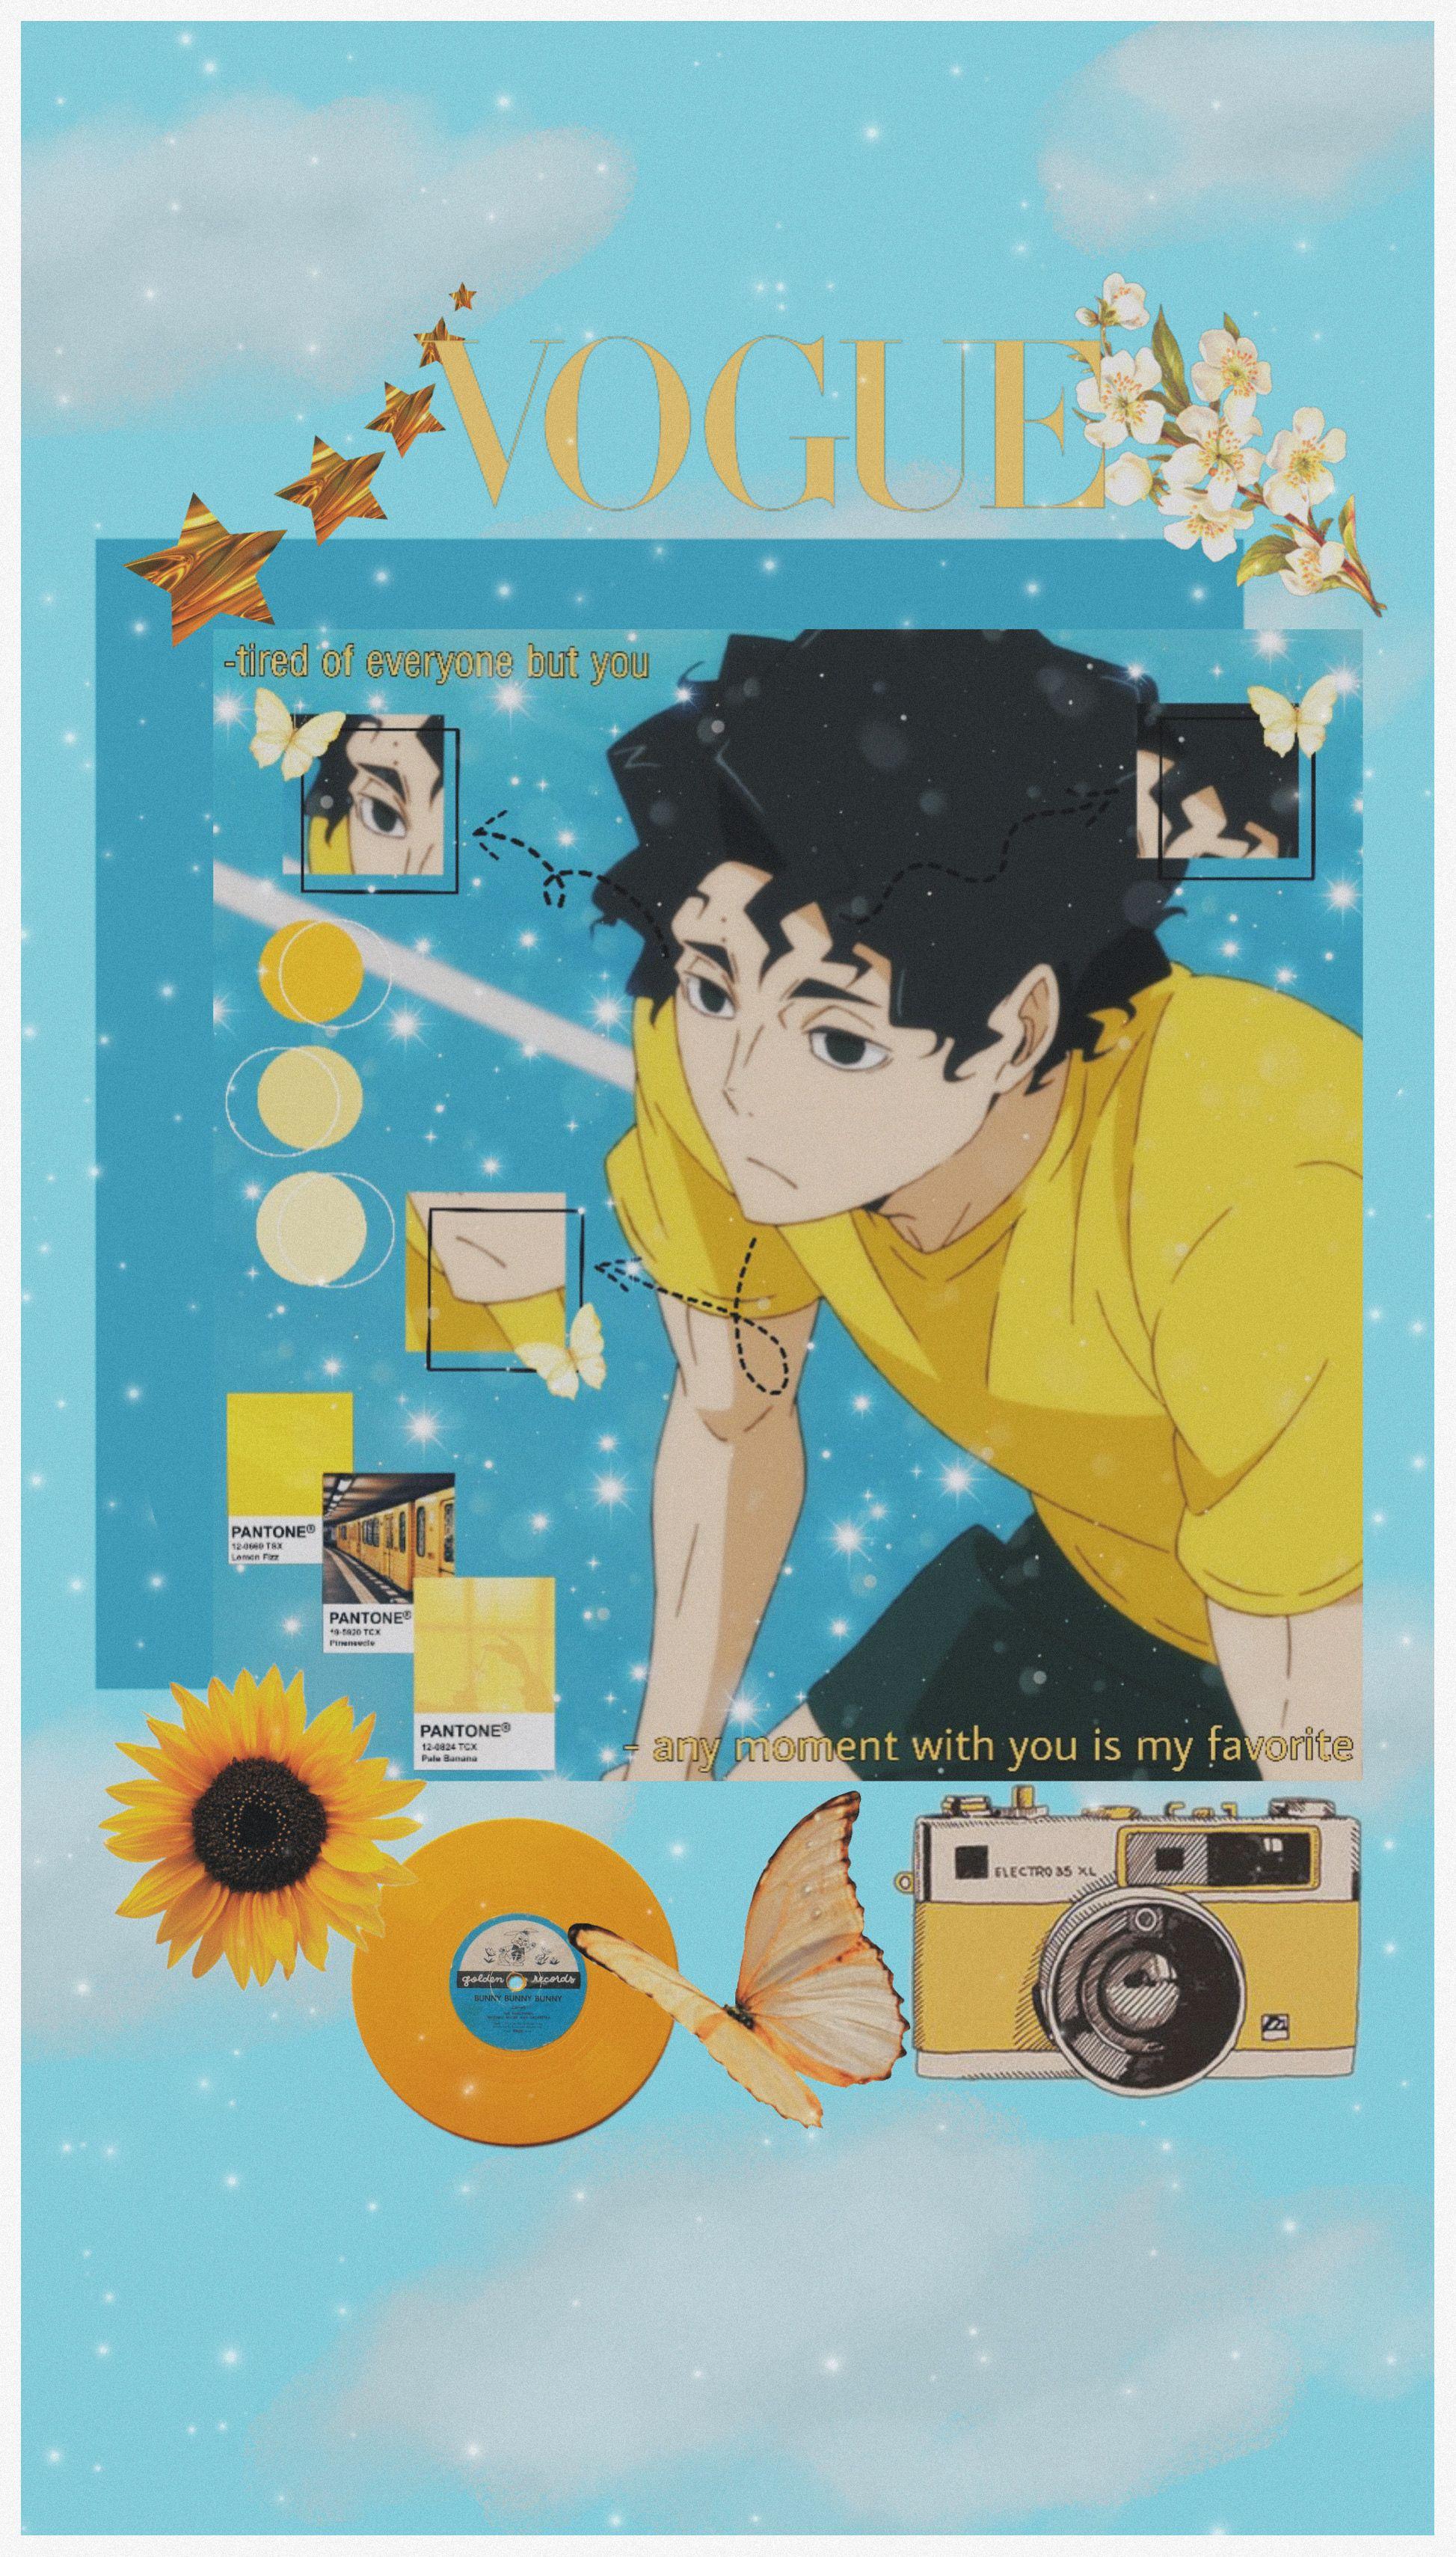 Haikyuu Wallpaper Sakusa Kiyoomi Haikyuu Wallpaper Anime Wallpaper Iphone Cute Anime Wallpaper